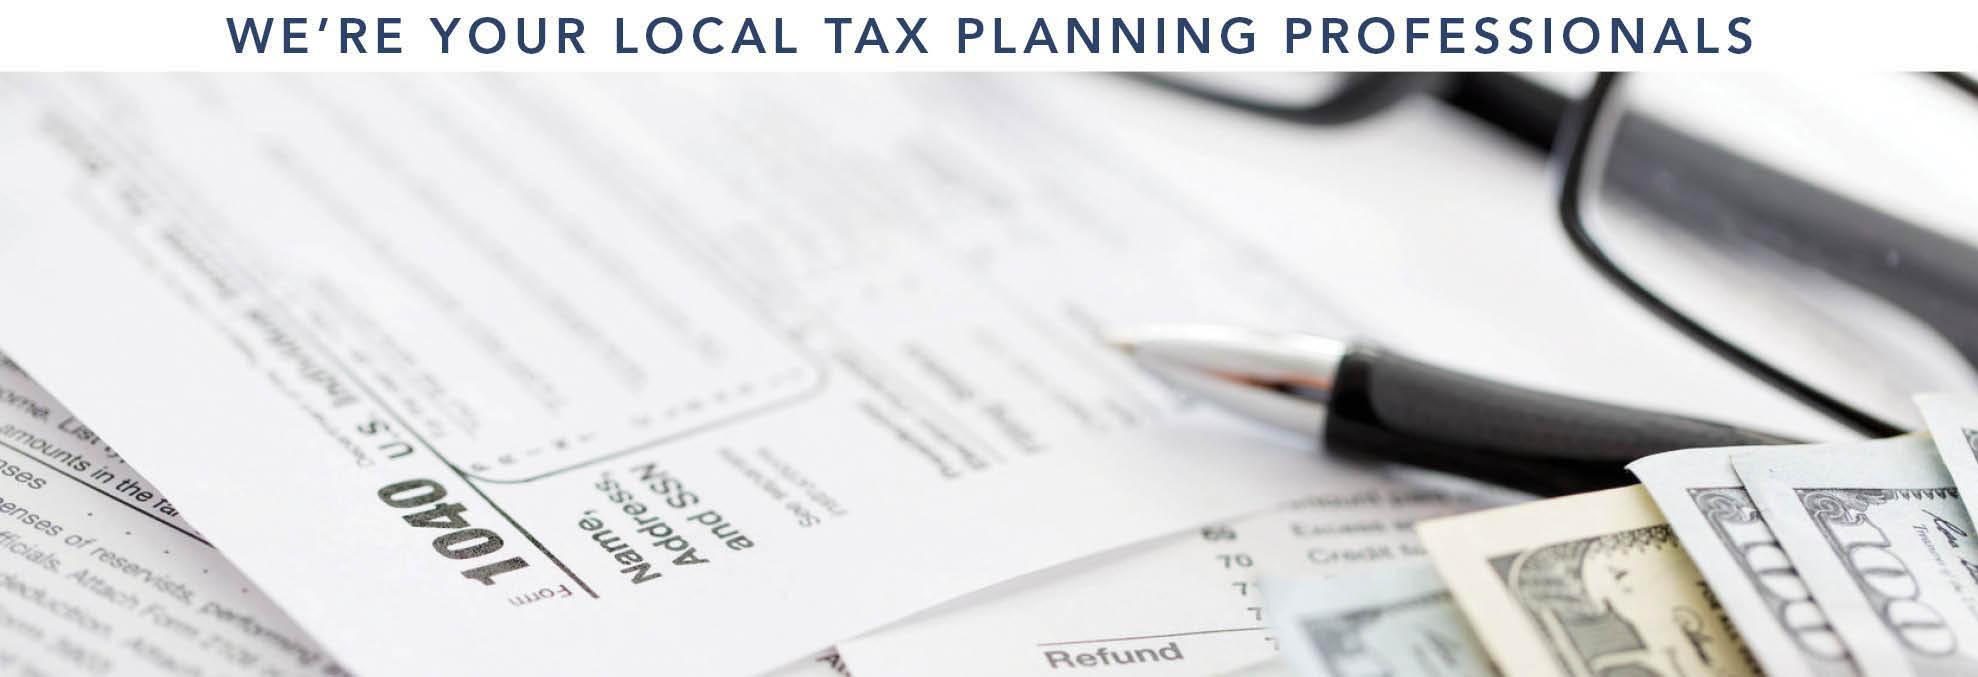 Katherine L Foley, CPA, AC, INC, Accoutant, Tax Professional, Logo, Tax Logo